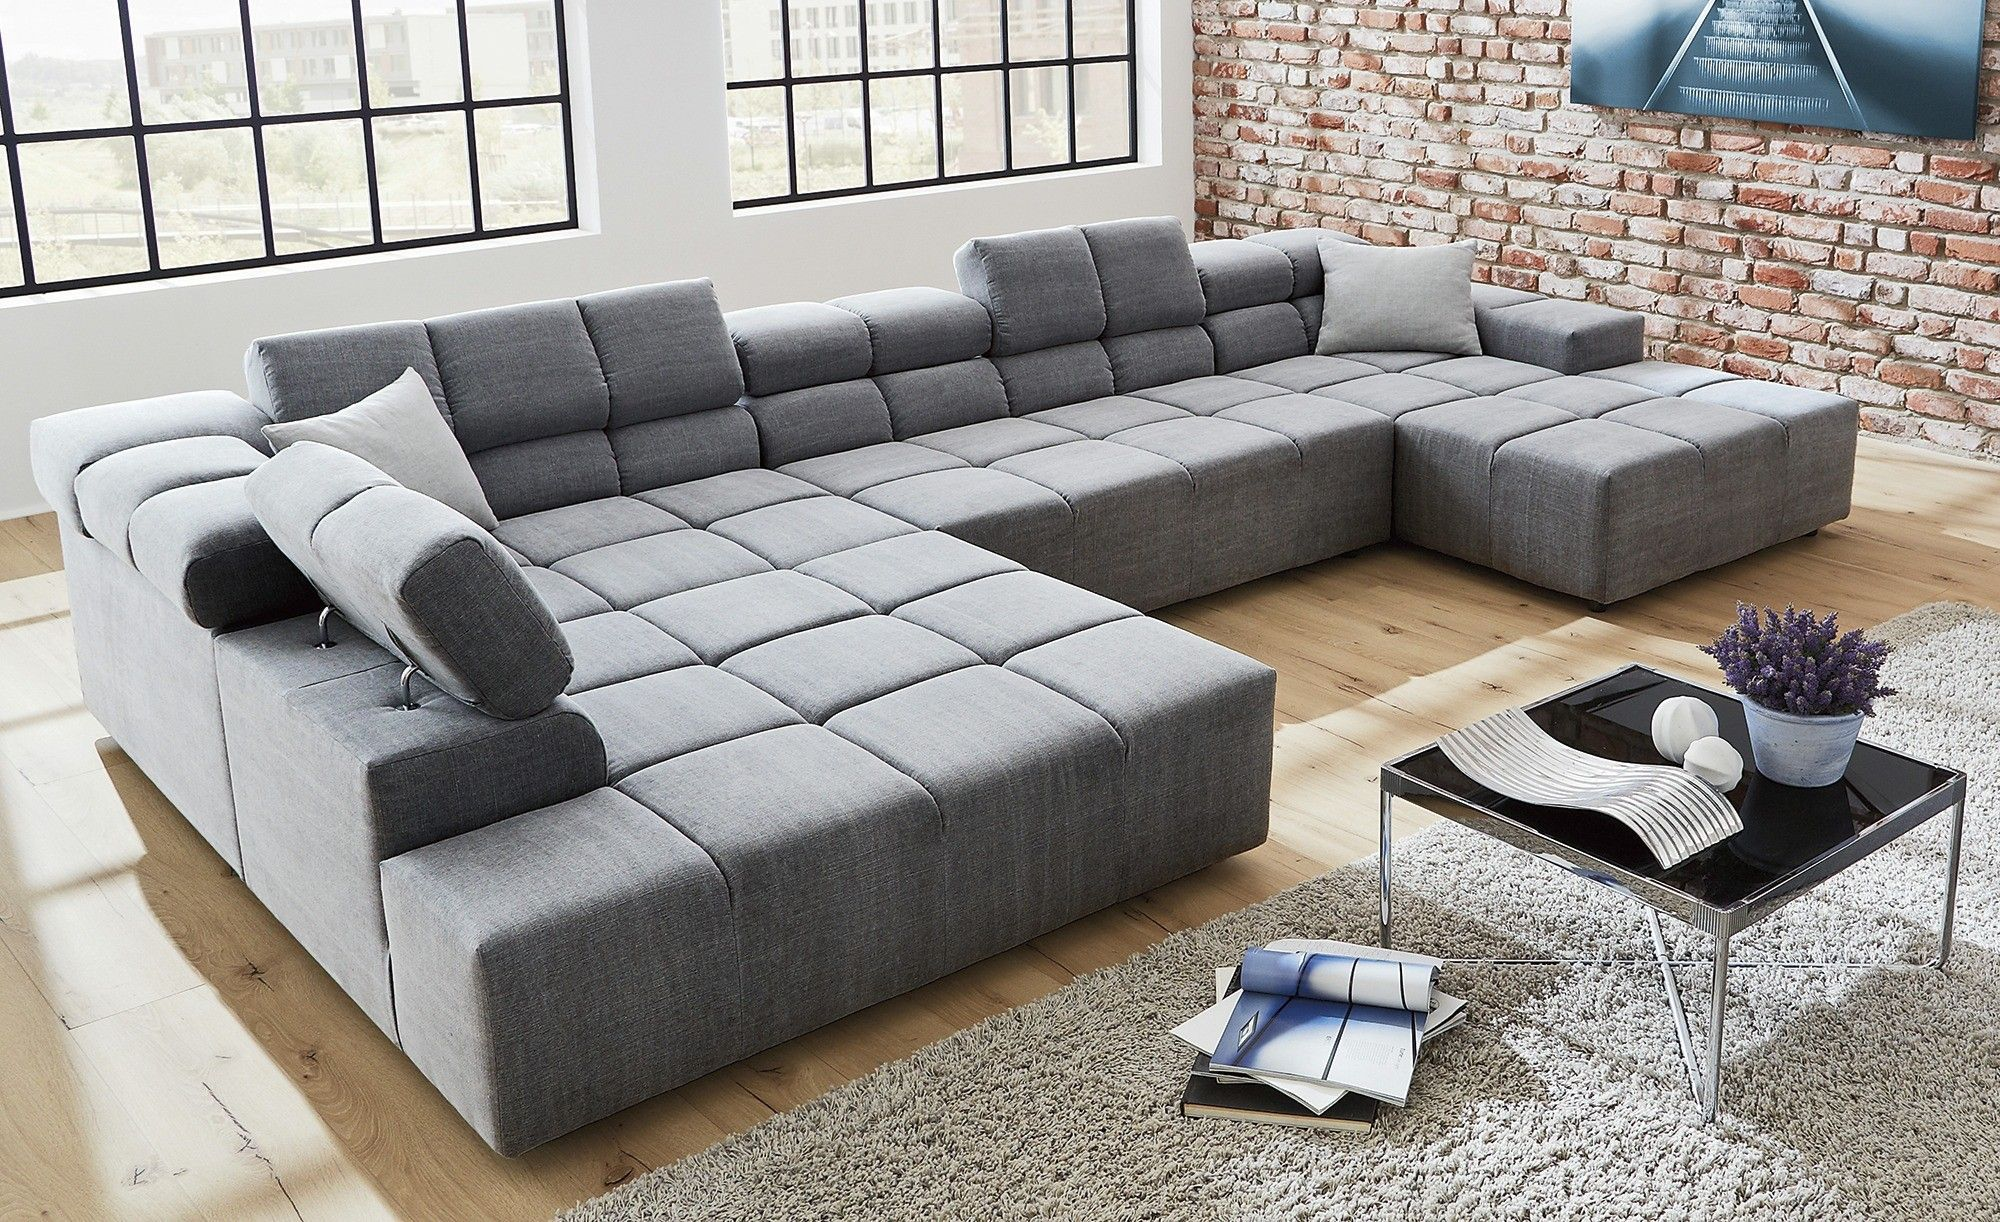 Ecksofa Breit 1 In 2020 Big Sofas Sofa Home Modern Bedroom